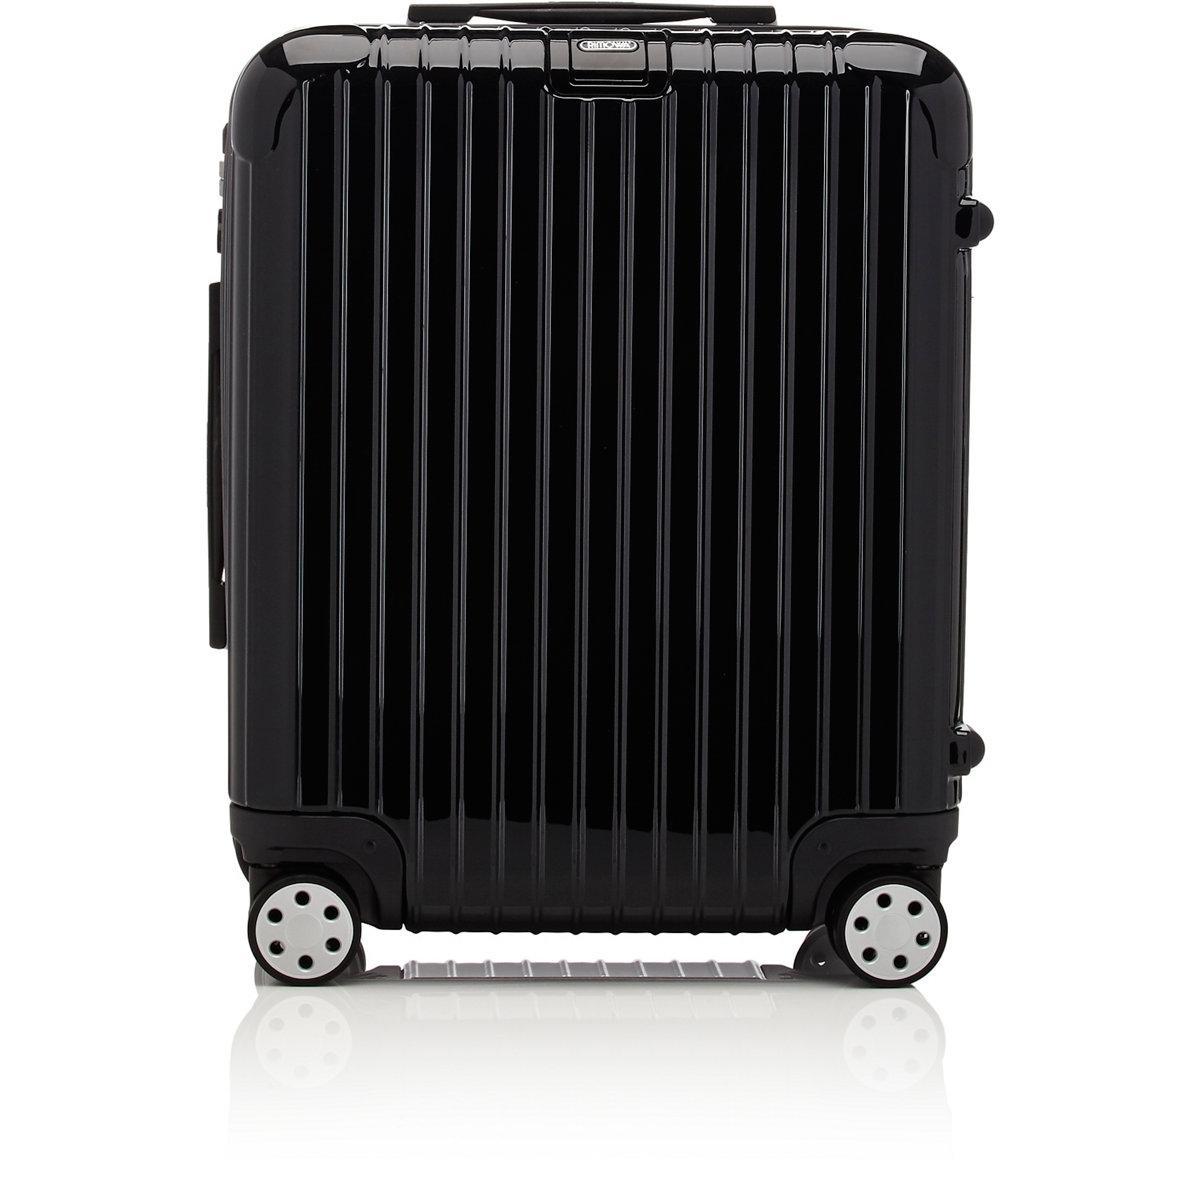 rimowa salsa deluxe 22 cabin multiwheel trolley in black. Black Bedroom Furniture Sets. Home Design Ideas